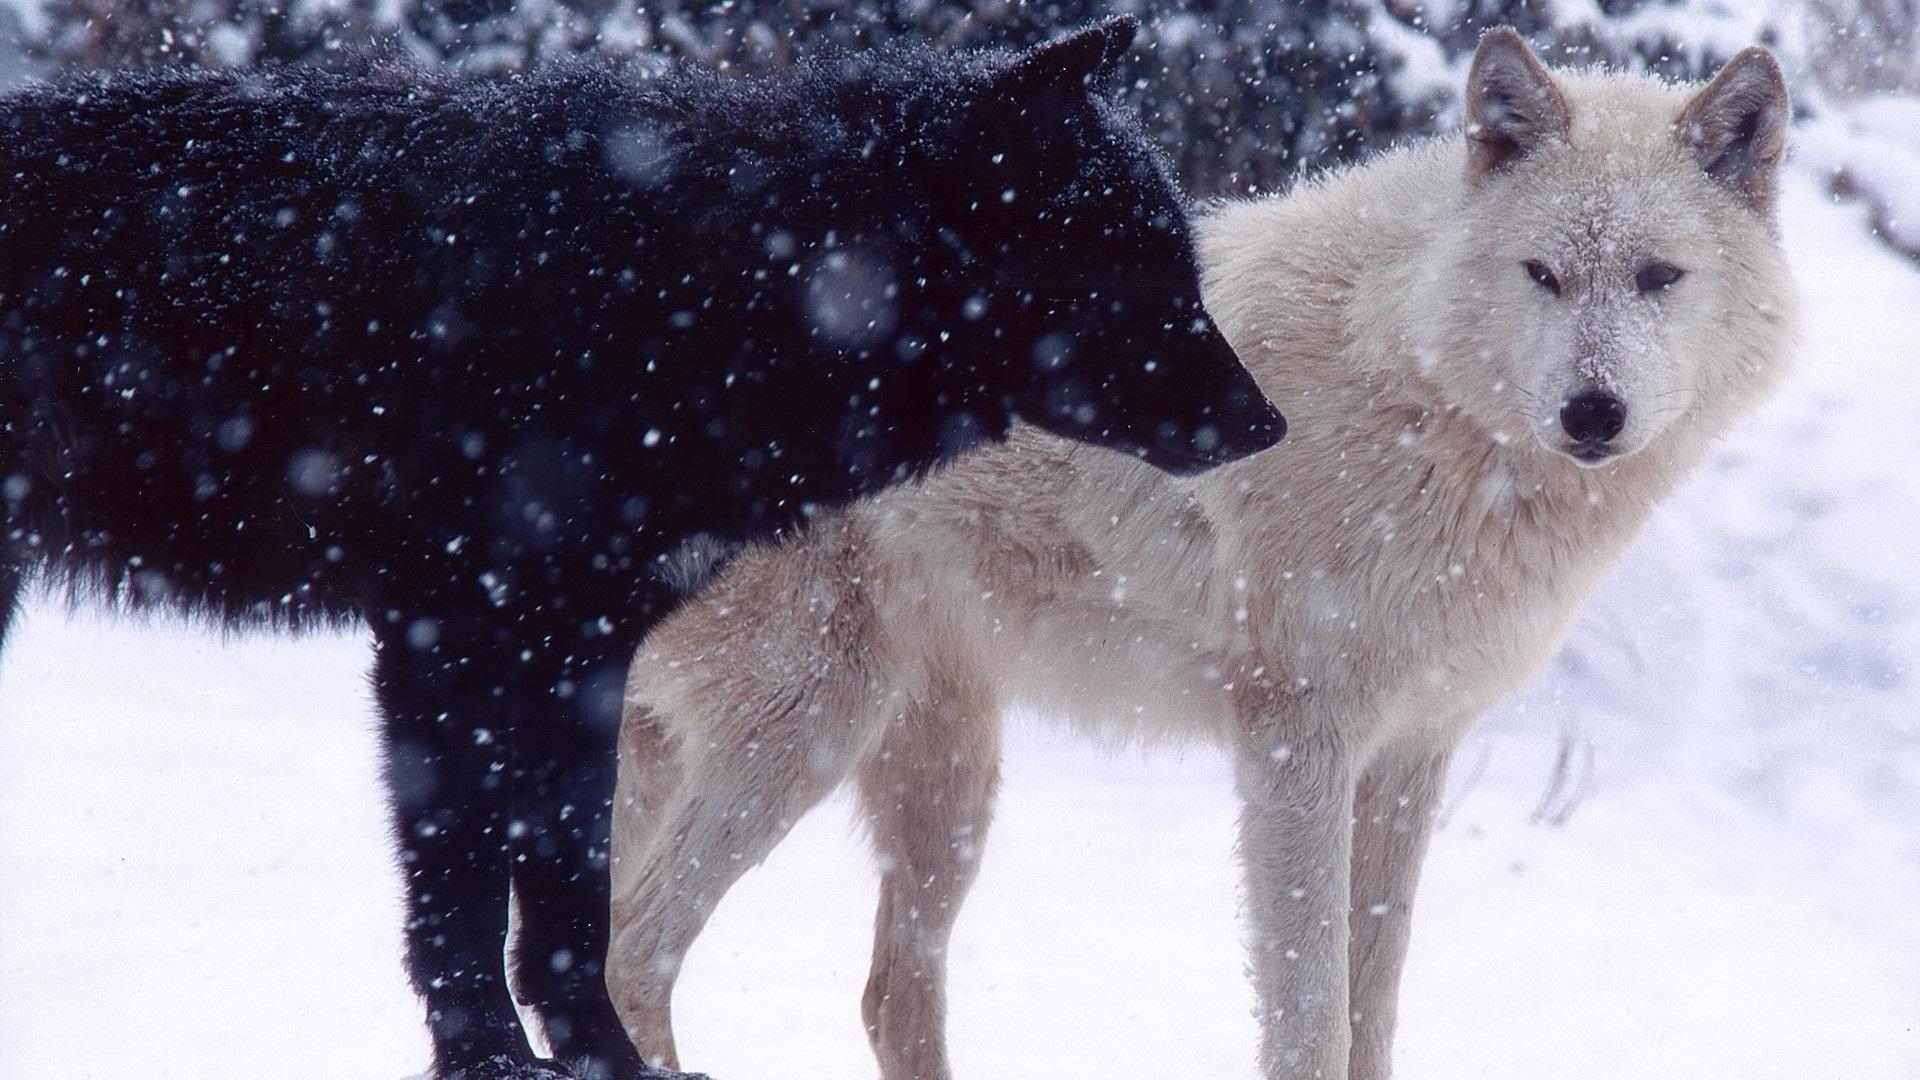 Pack Of Wolves Wallpaper 2880×1800 Id 40799 Wallpapervortex